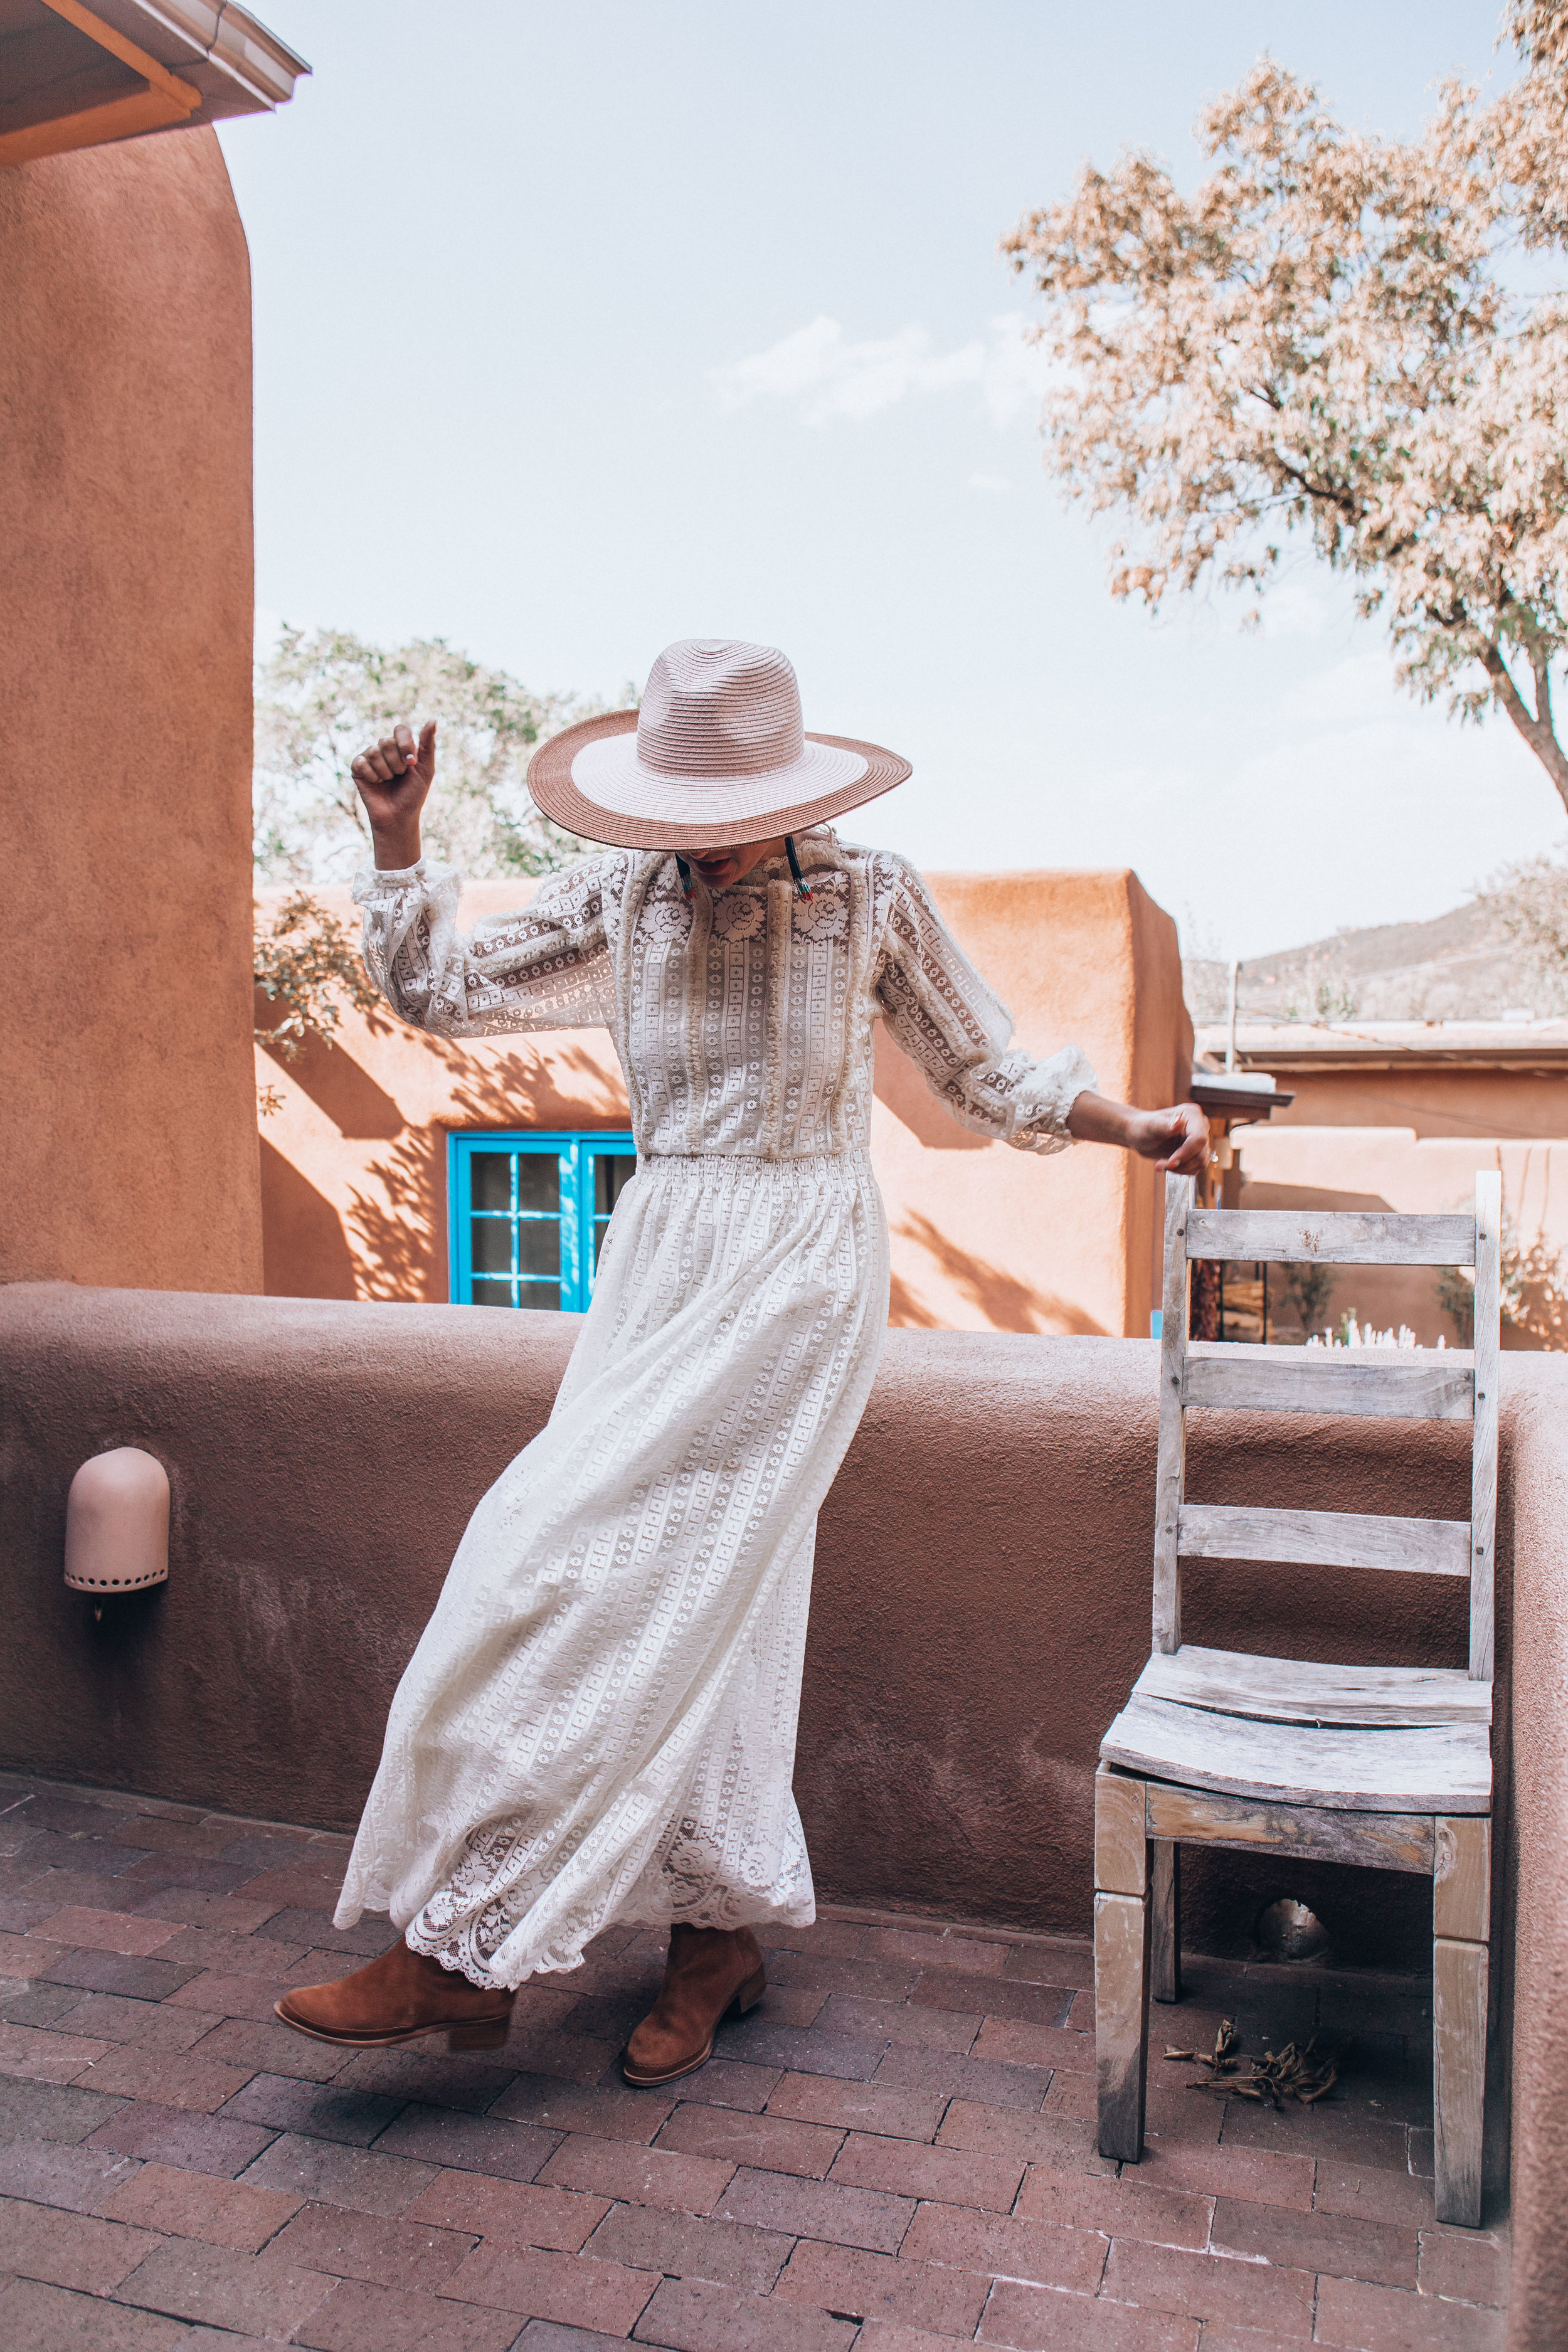 Santa Fe, July 2018 | Photo: Elizabeth Birnbaum /// @thecuratedfeast